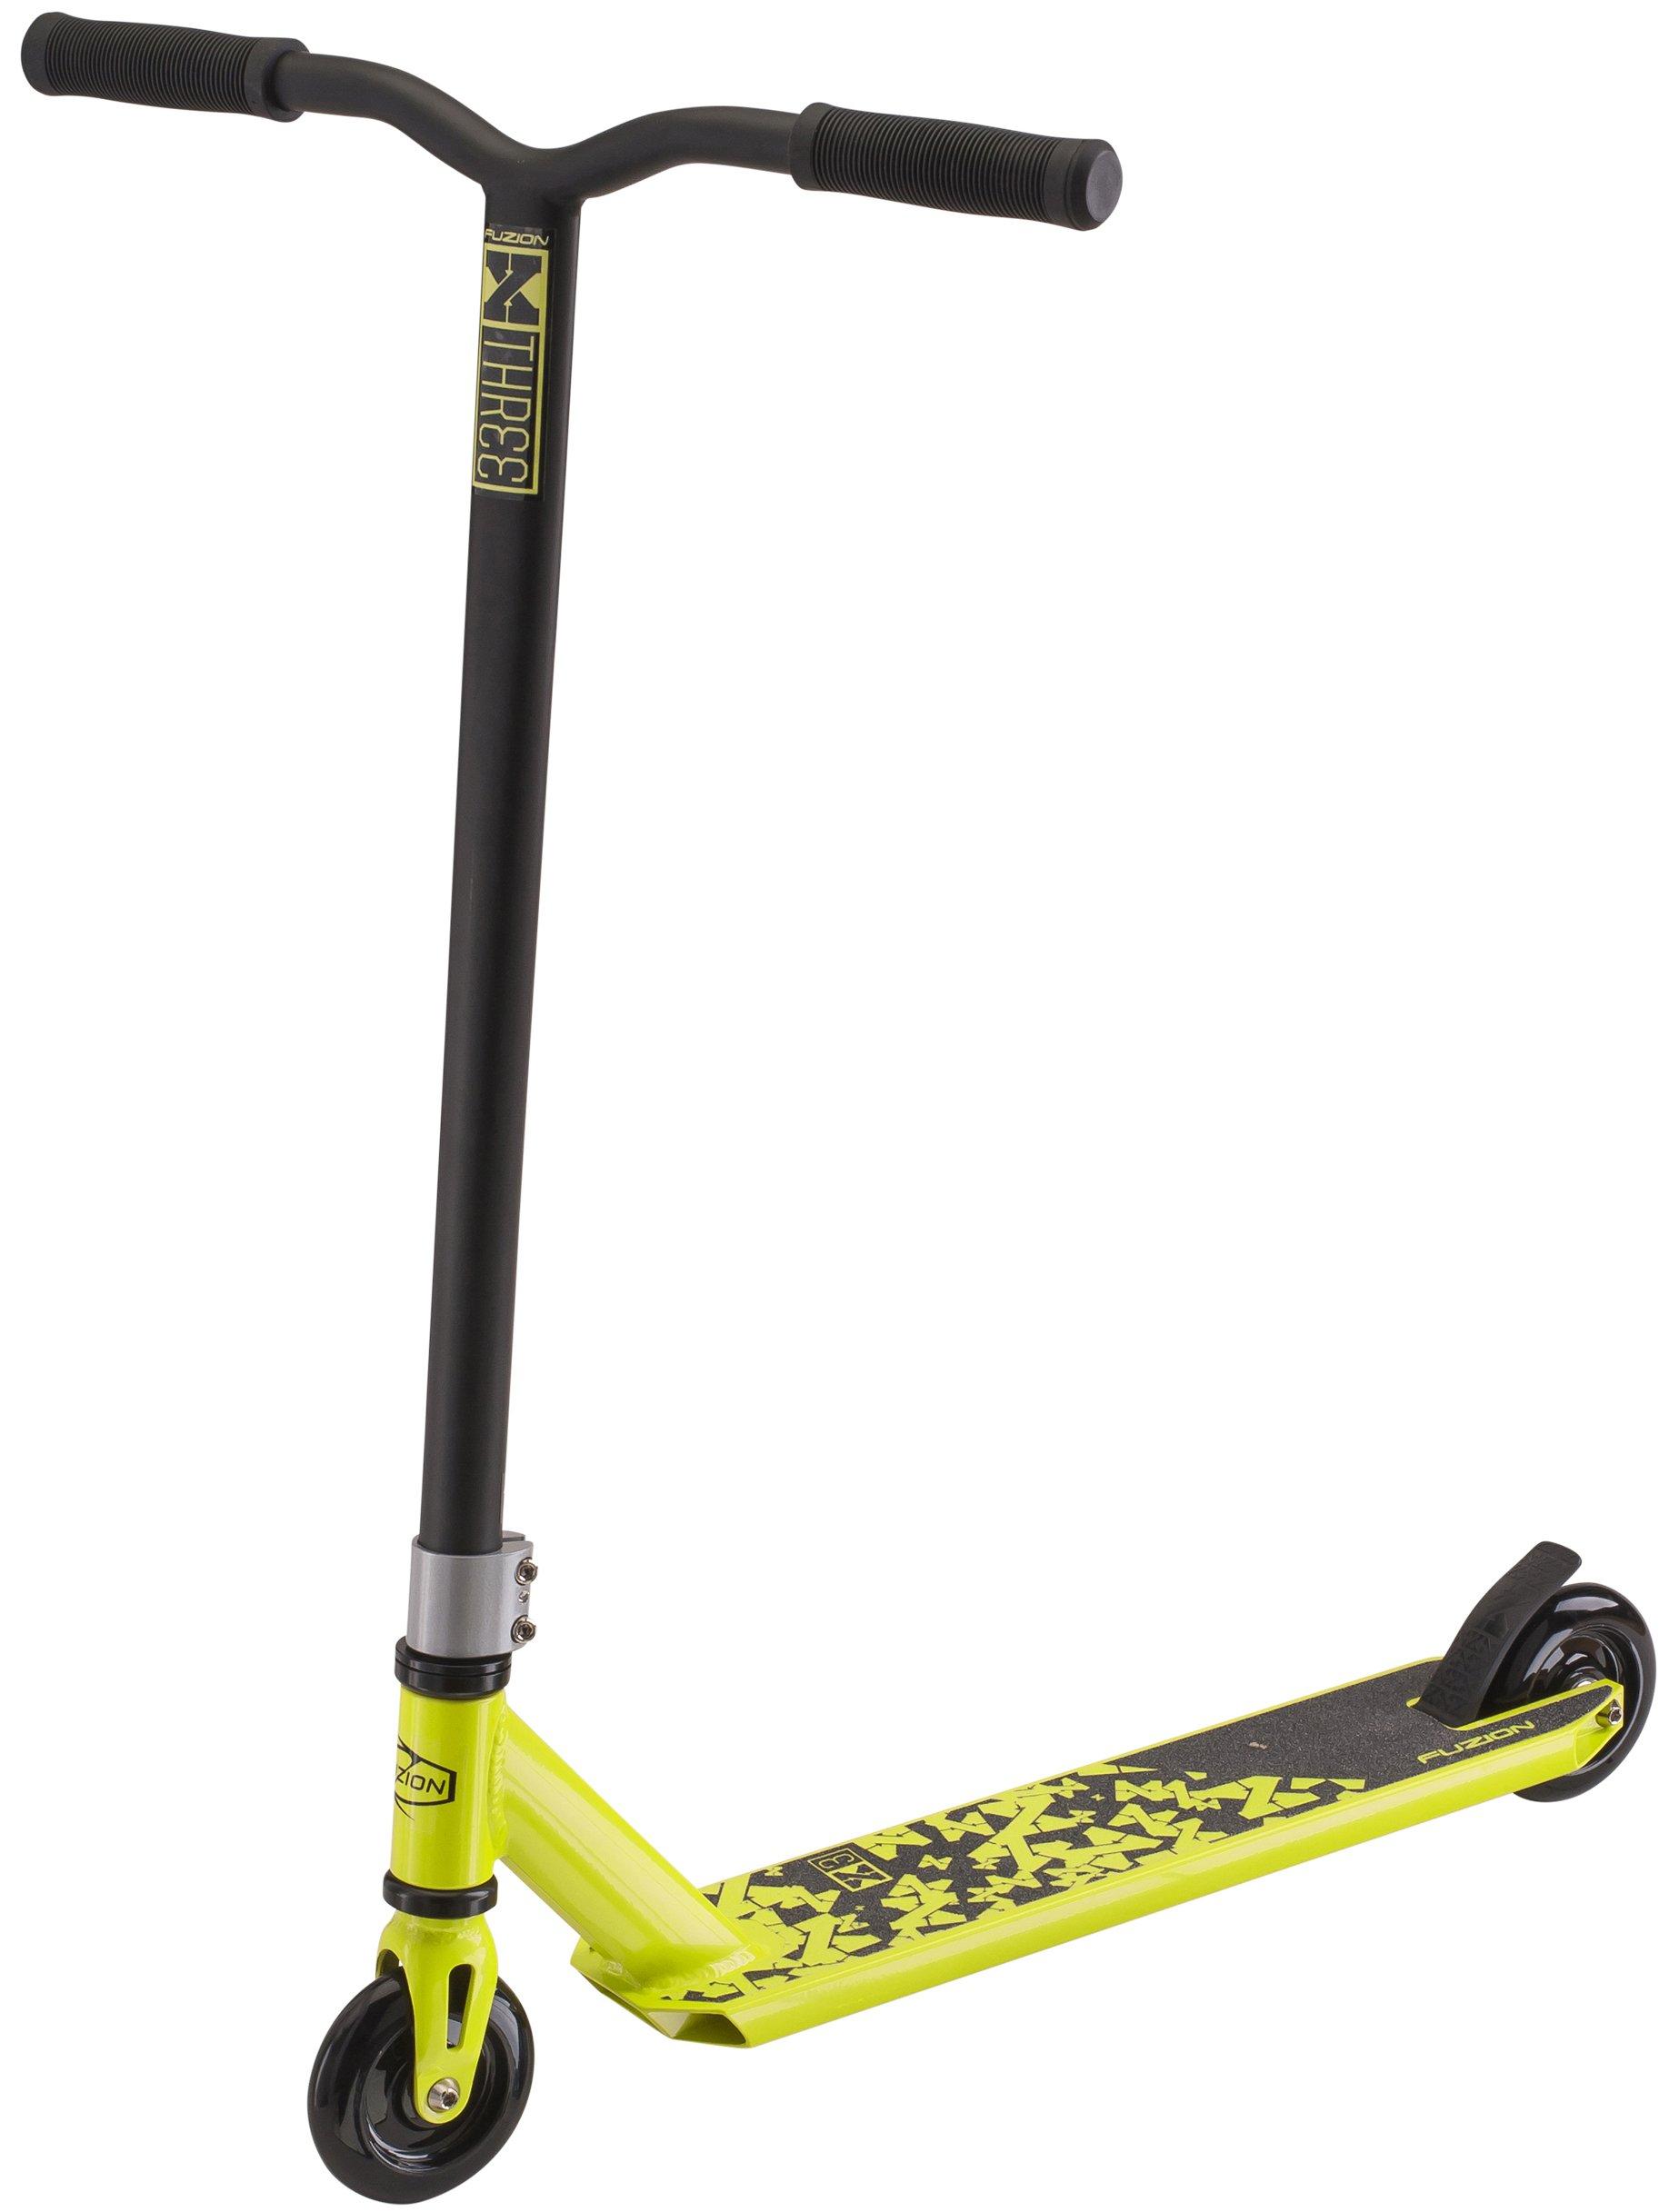 Fuzion X-3 Pro Scooter (2018 Neon)